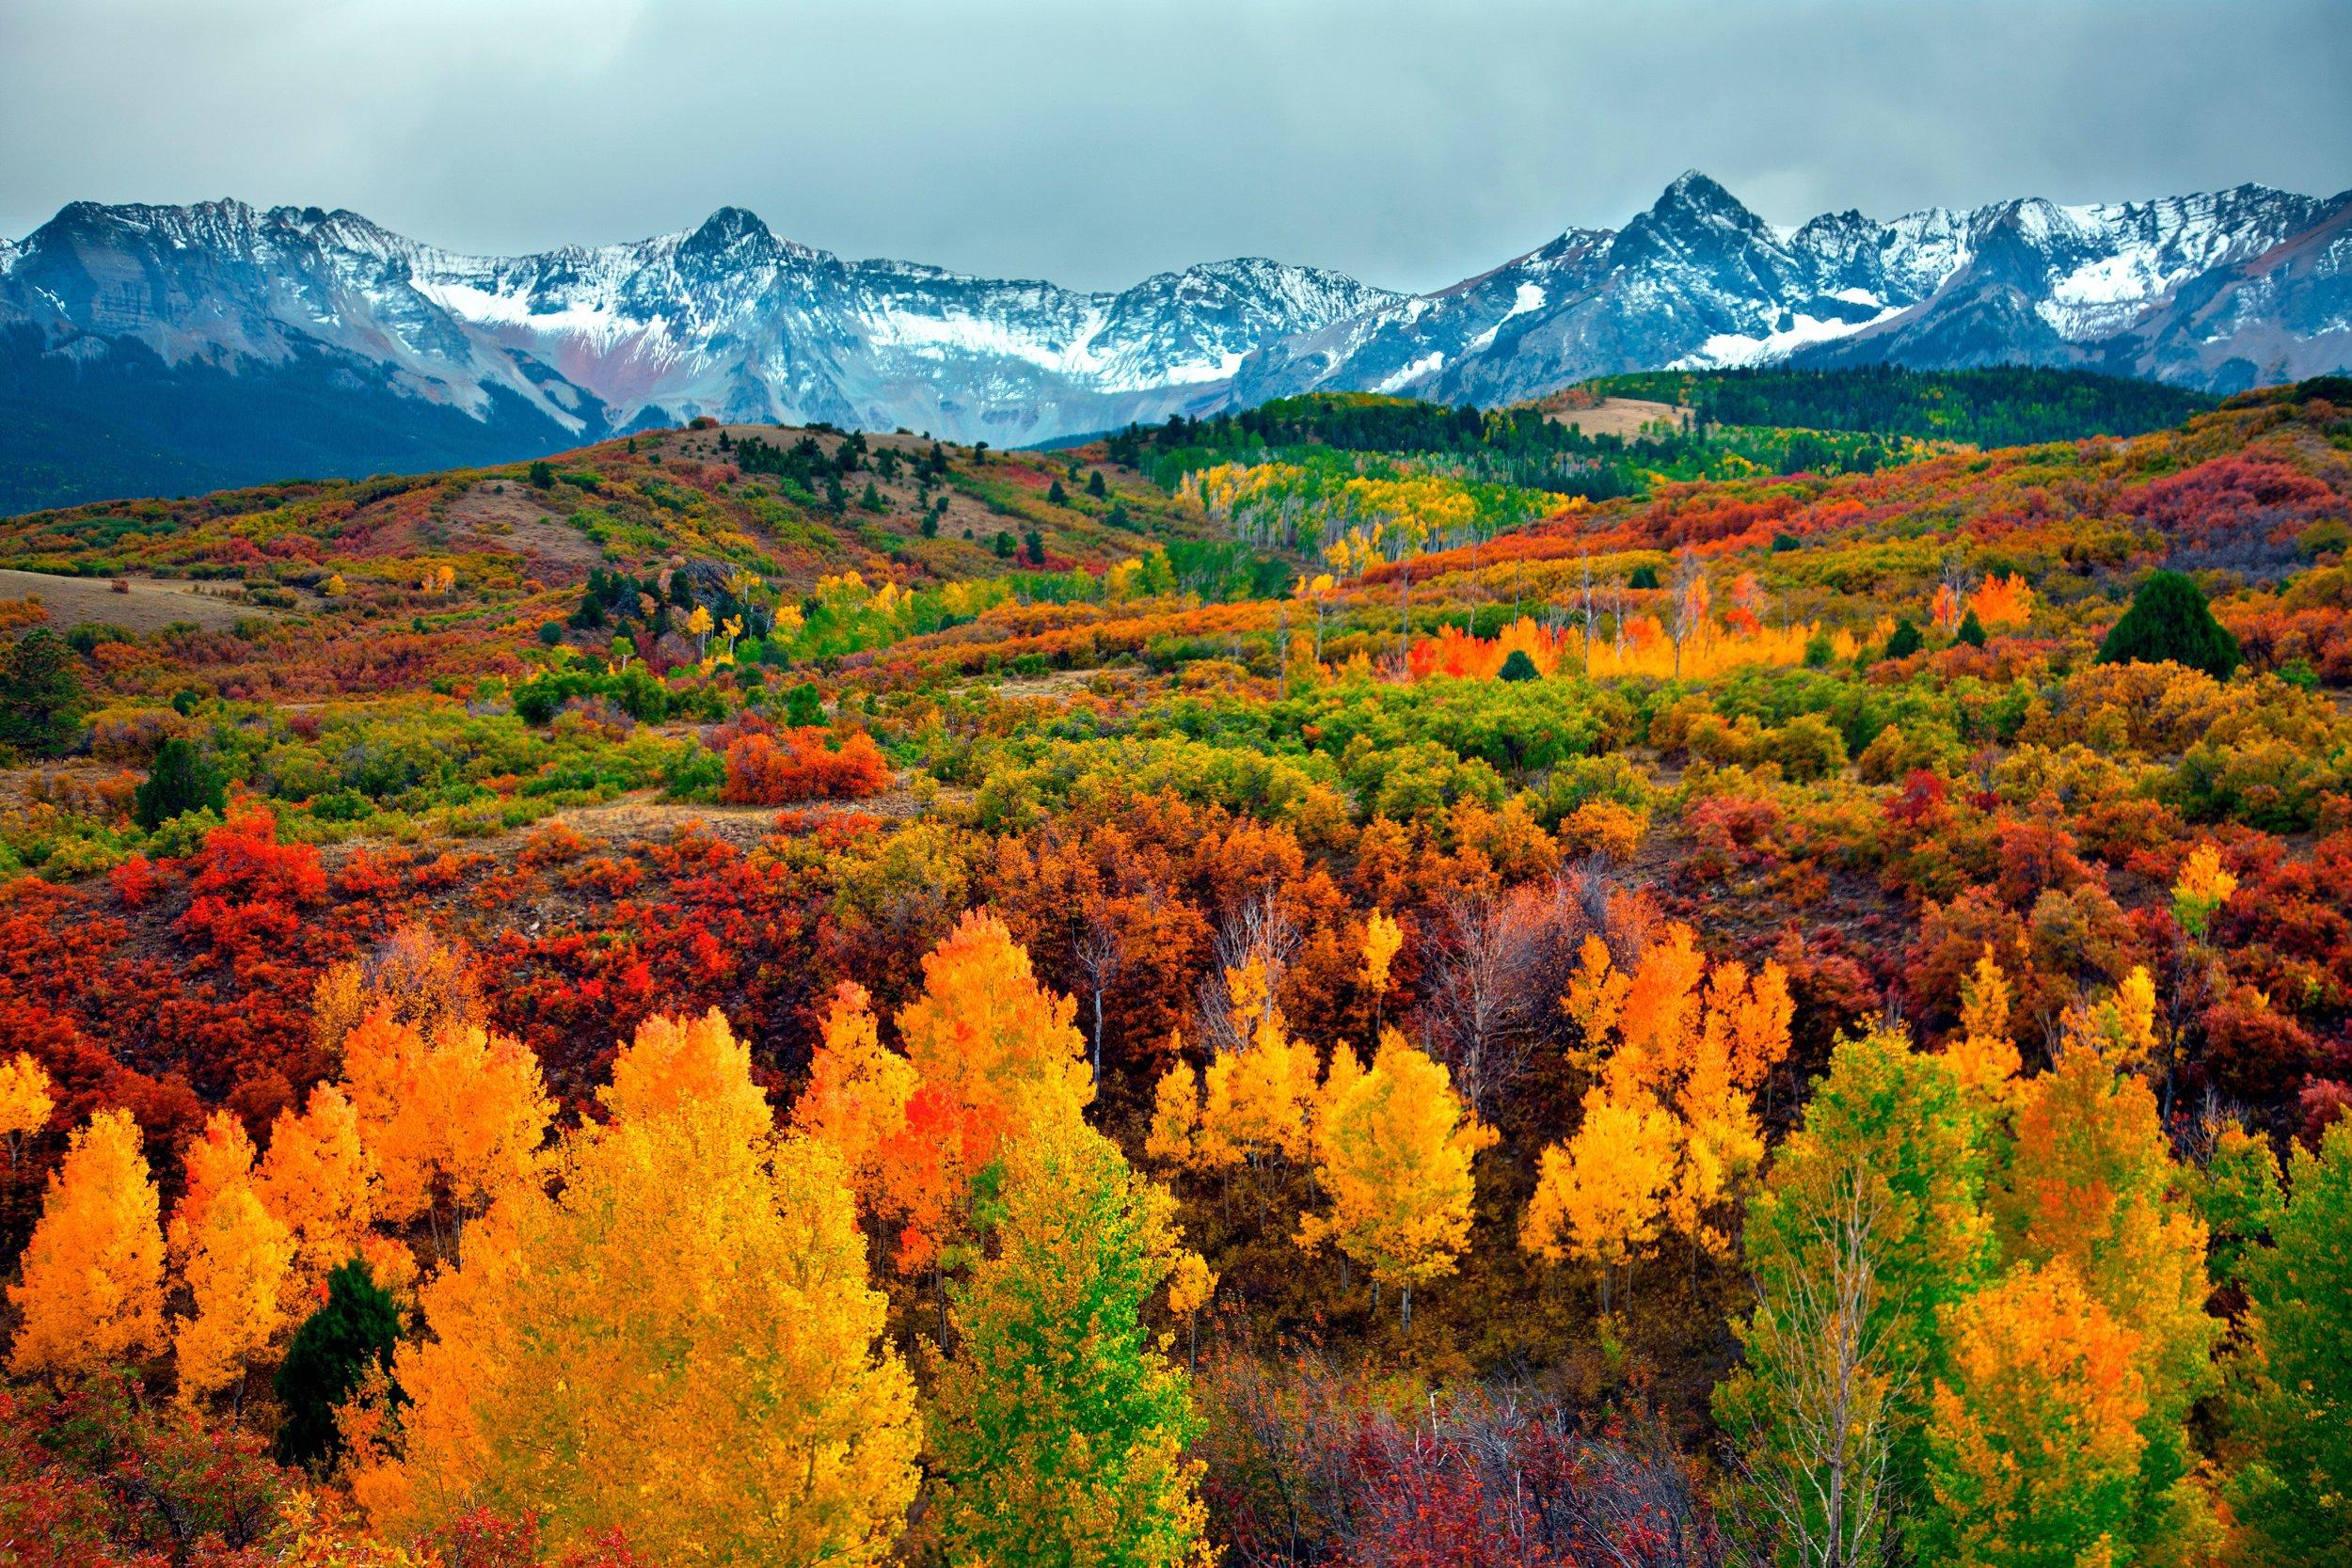 Fall-in-colorado2.jpg